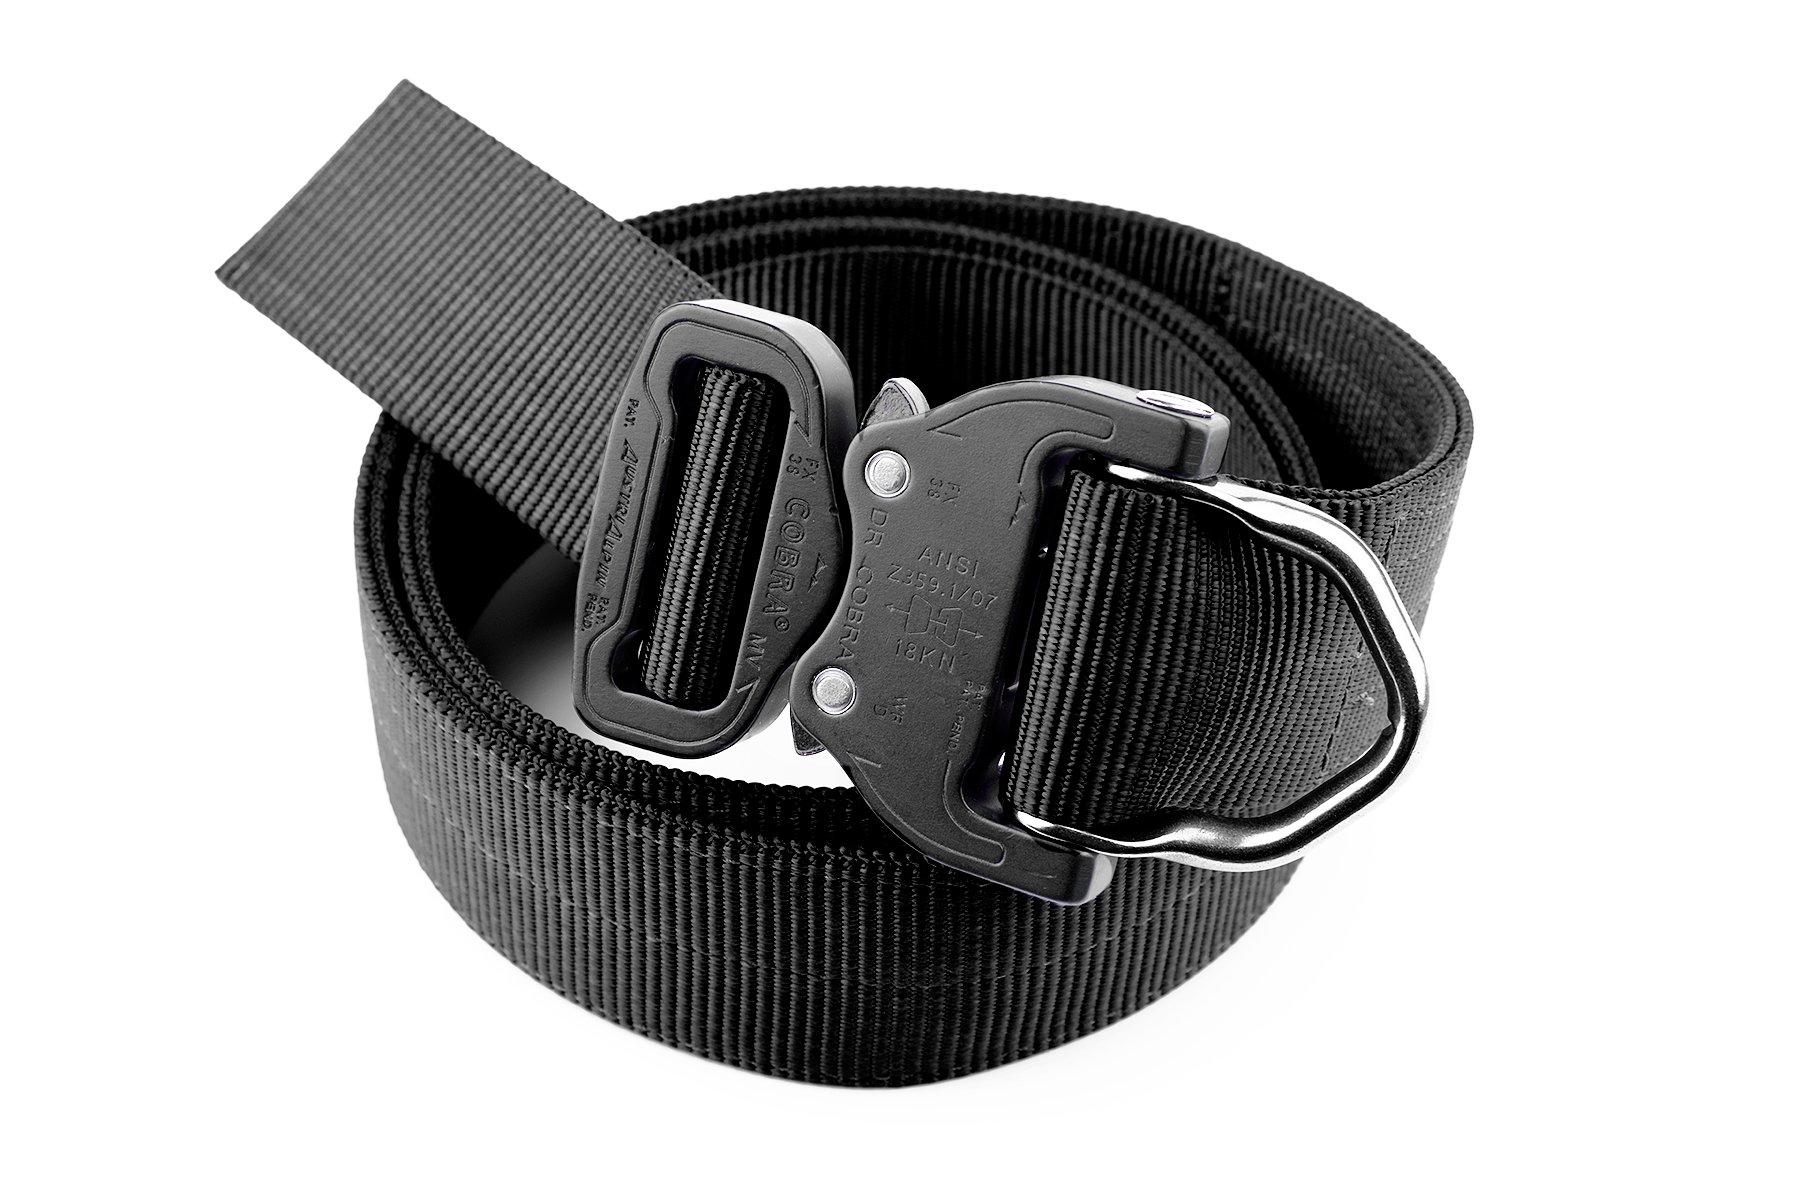 Cobra Quick Release Buckle Men's Tactical Belt -2 PLY 1.5'' D-Ring Riggers Belt